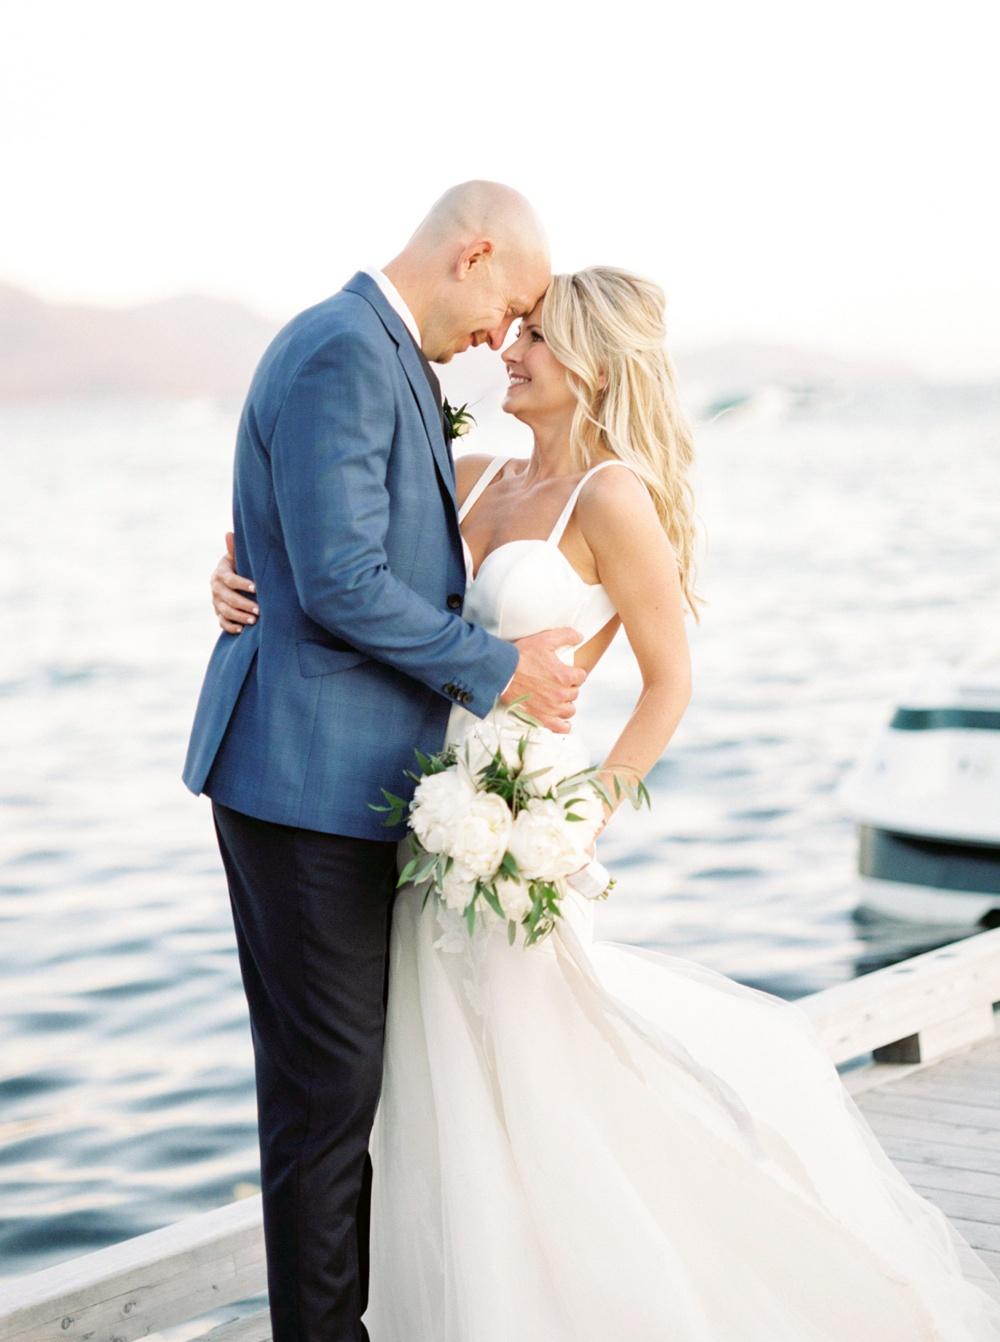 Hyatt-Lake-Tahoe-Wedding-Photographer-Regency-Mandy-Ford-Photography_0059.jpg